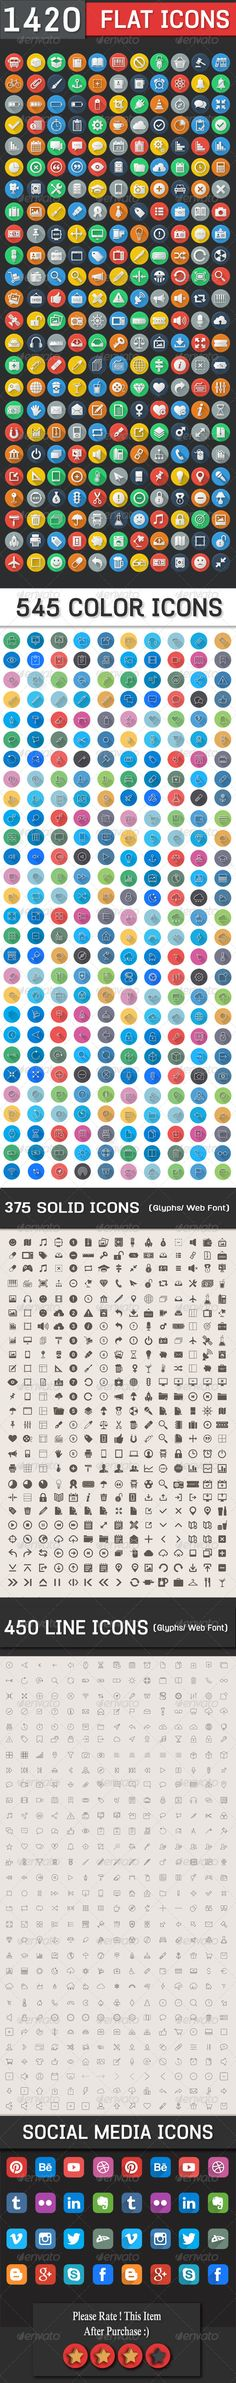 1420 Flat Icons - Colorful Icons Set http://gum.co/ddm9 #socialmediaicons #blogger #wordpress